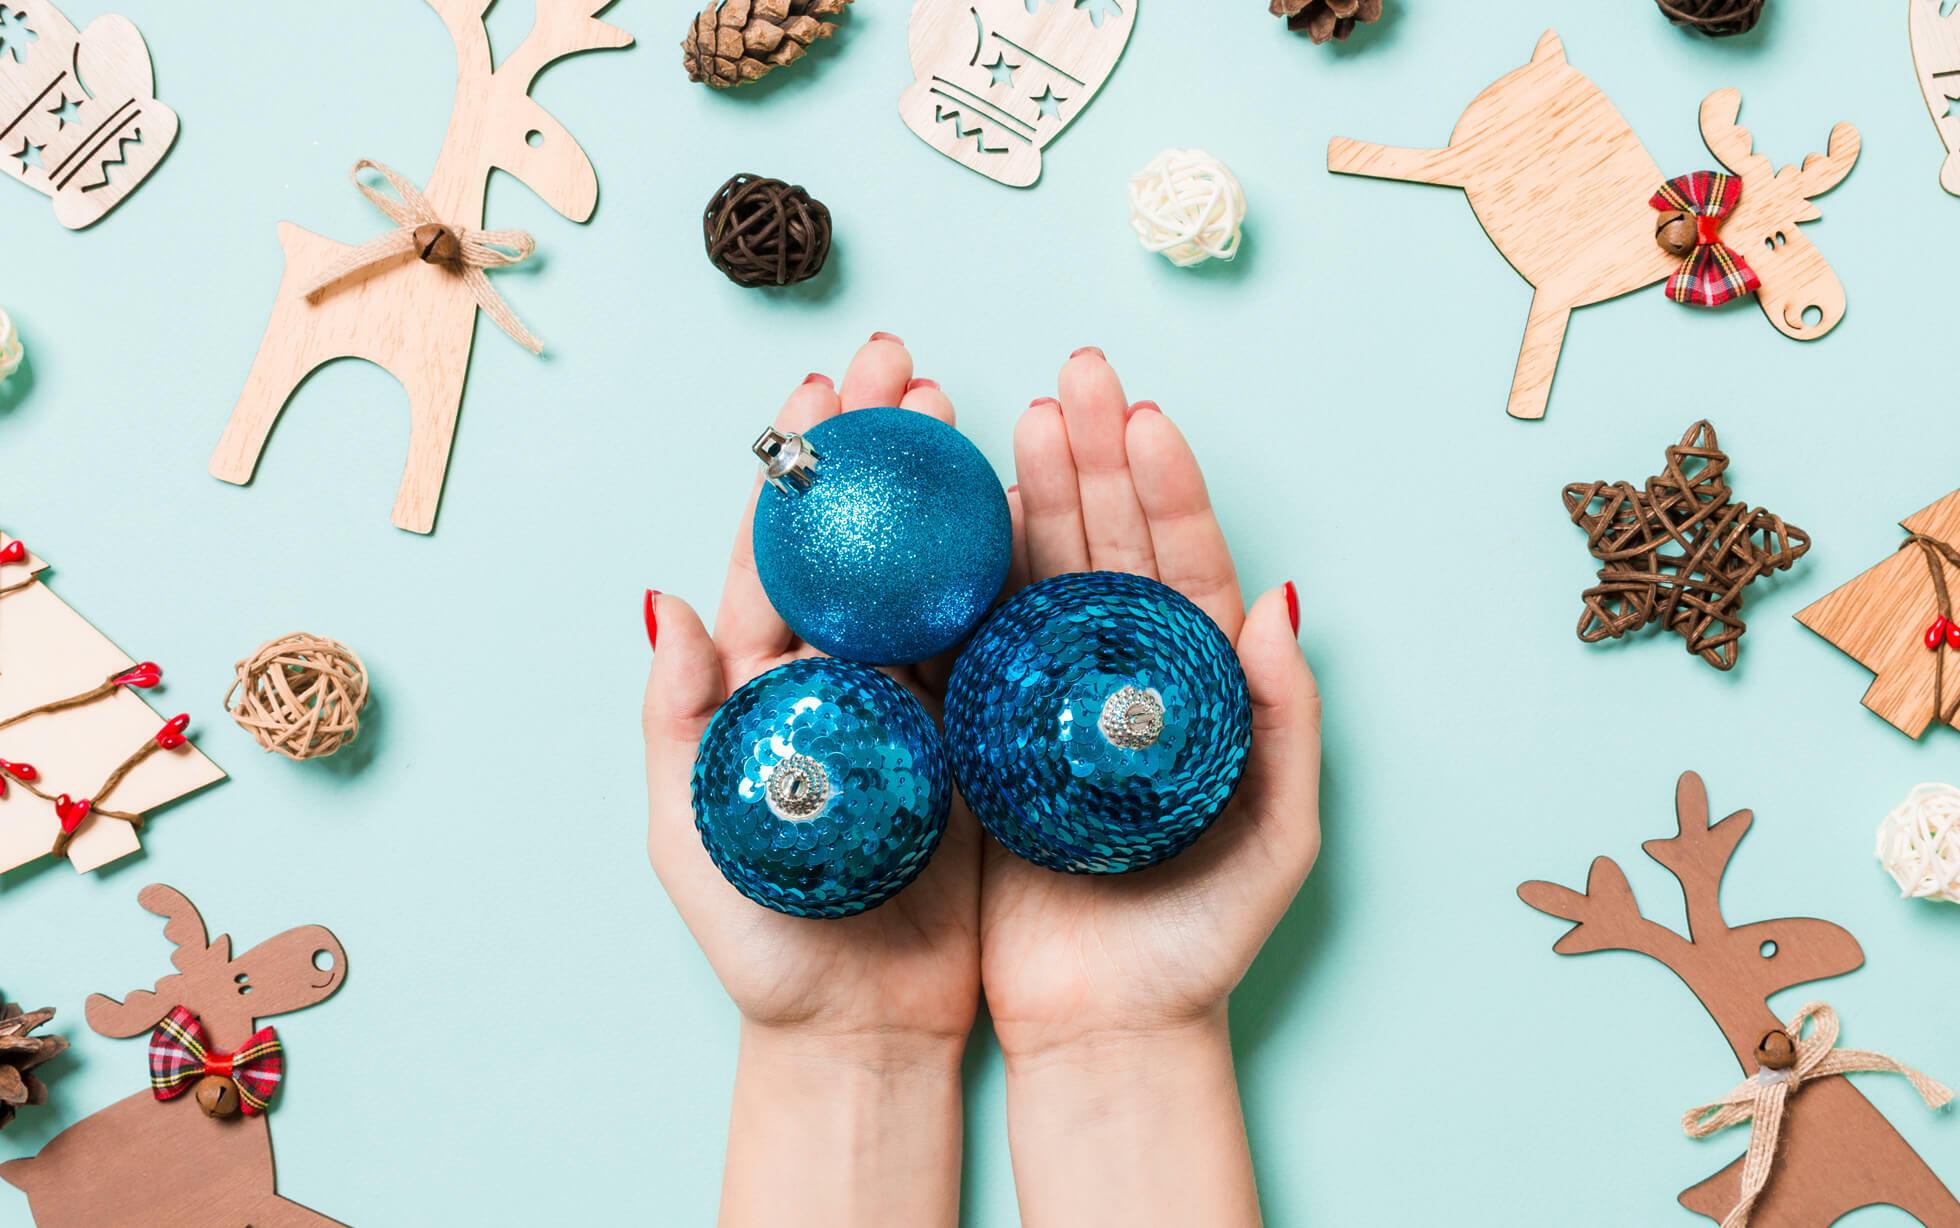 Decoración navideña fácil de hacer por ti mismo